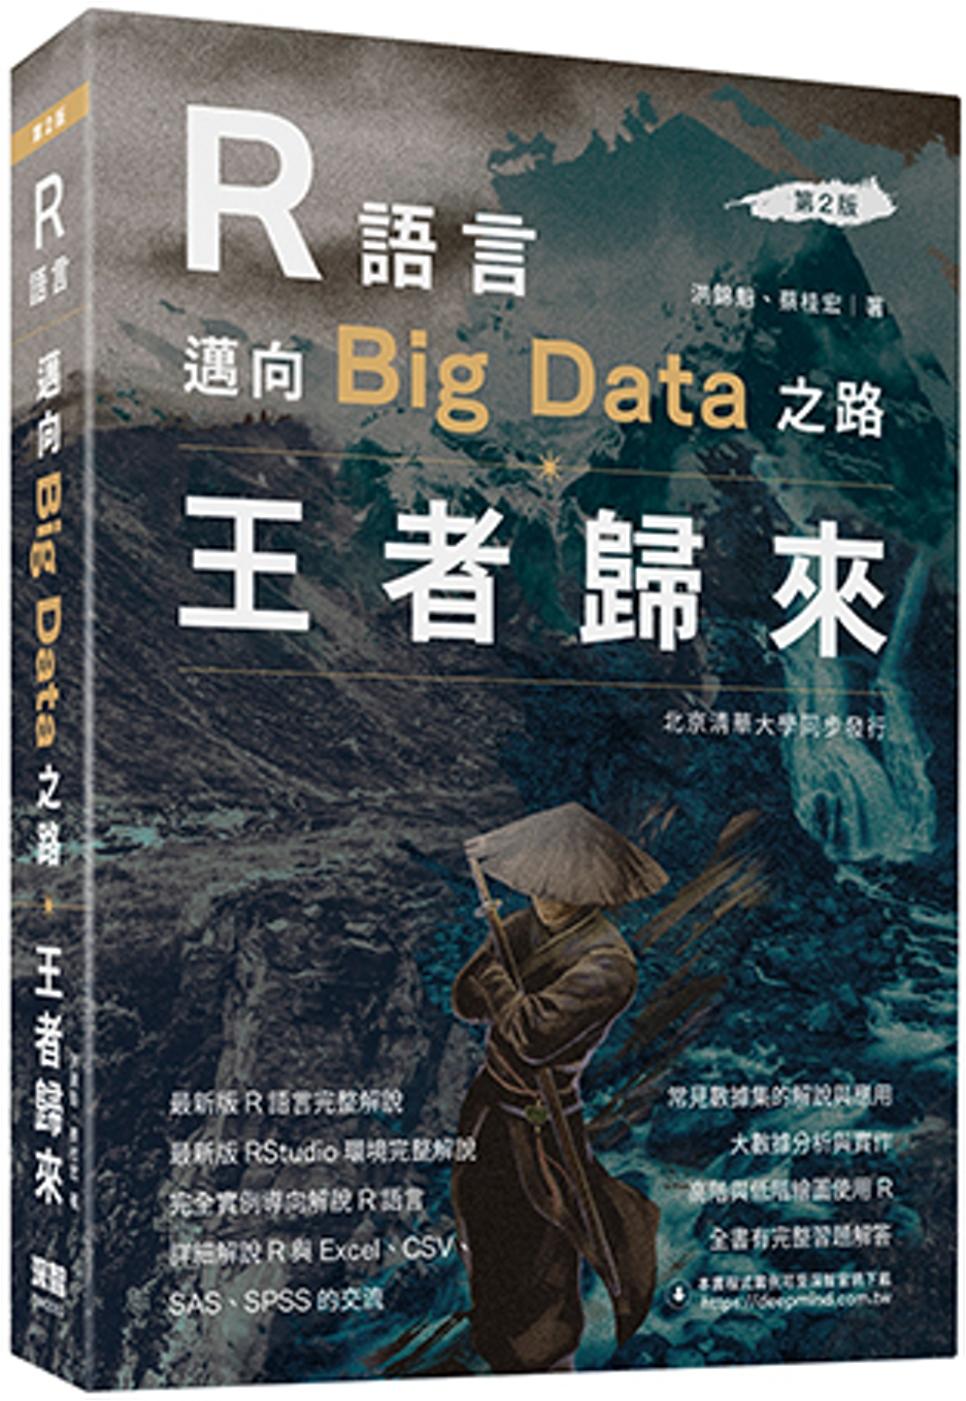 R語言邁向Big Data之路:王者歸來(第二版)